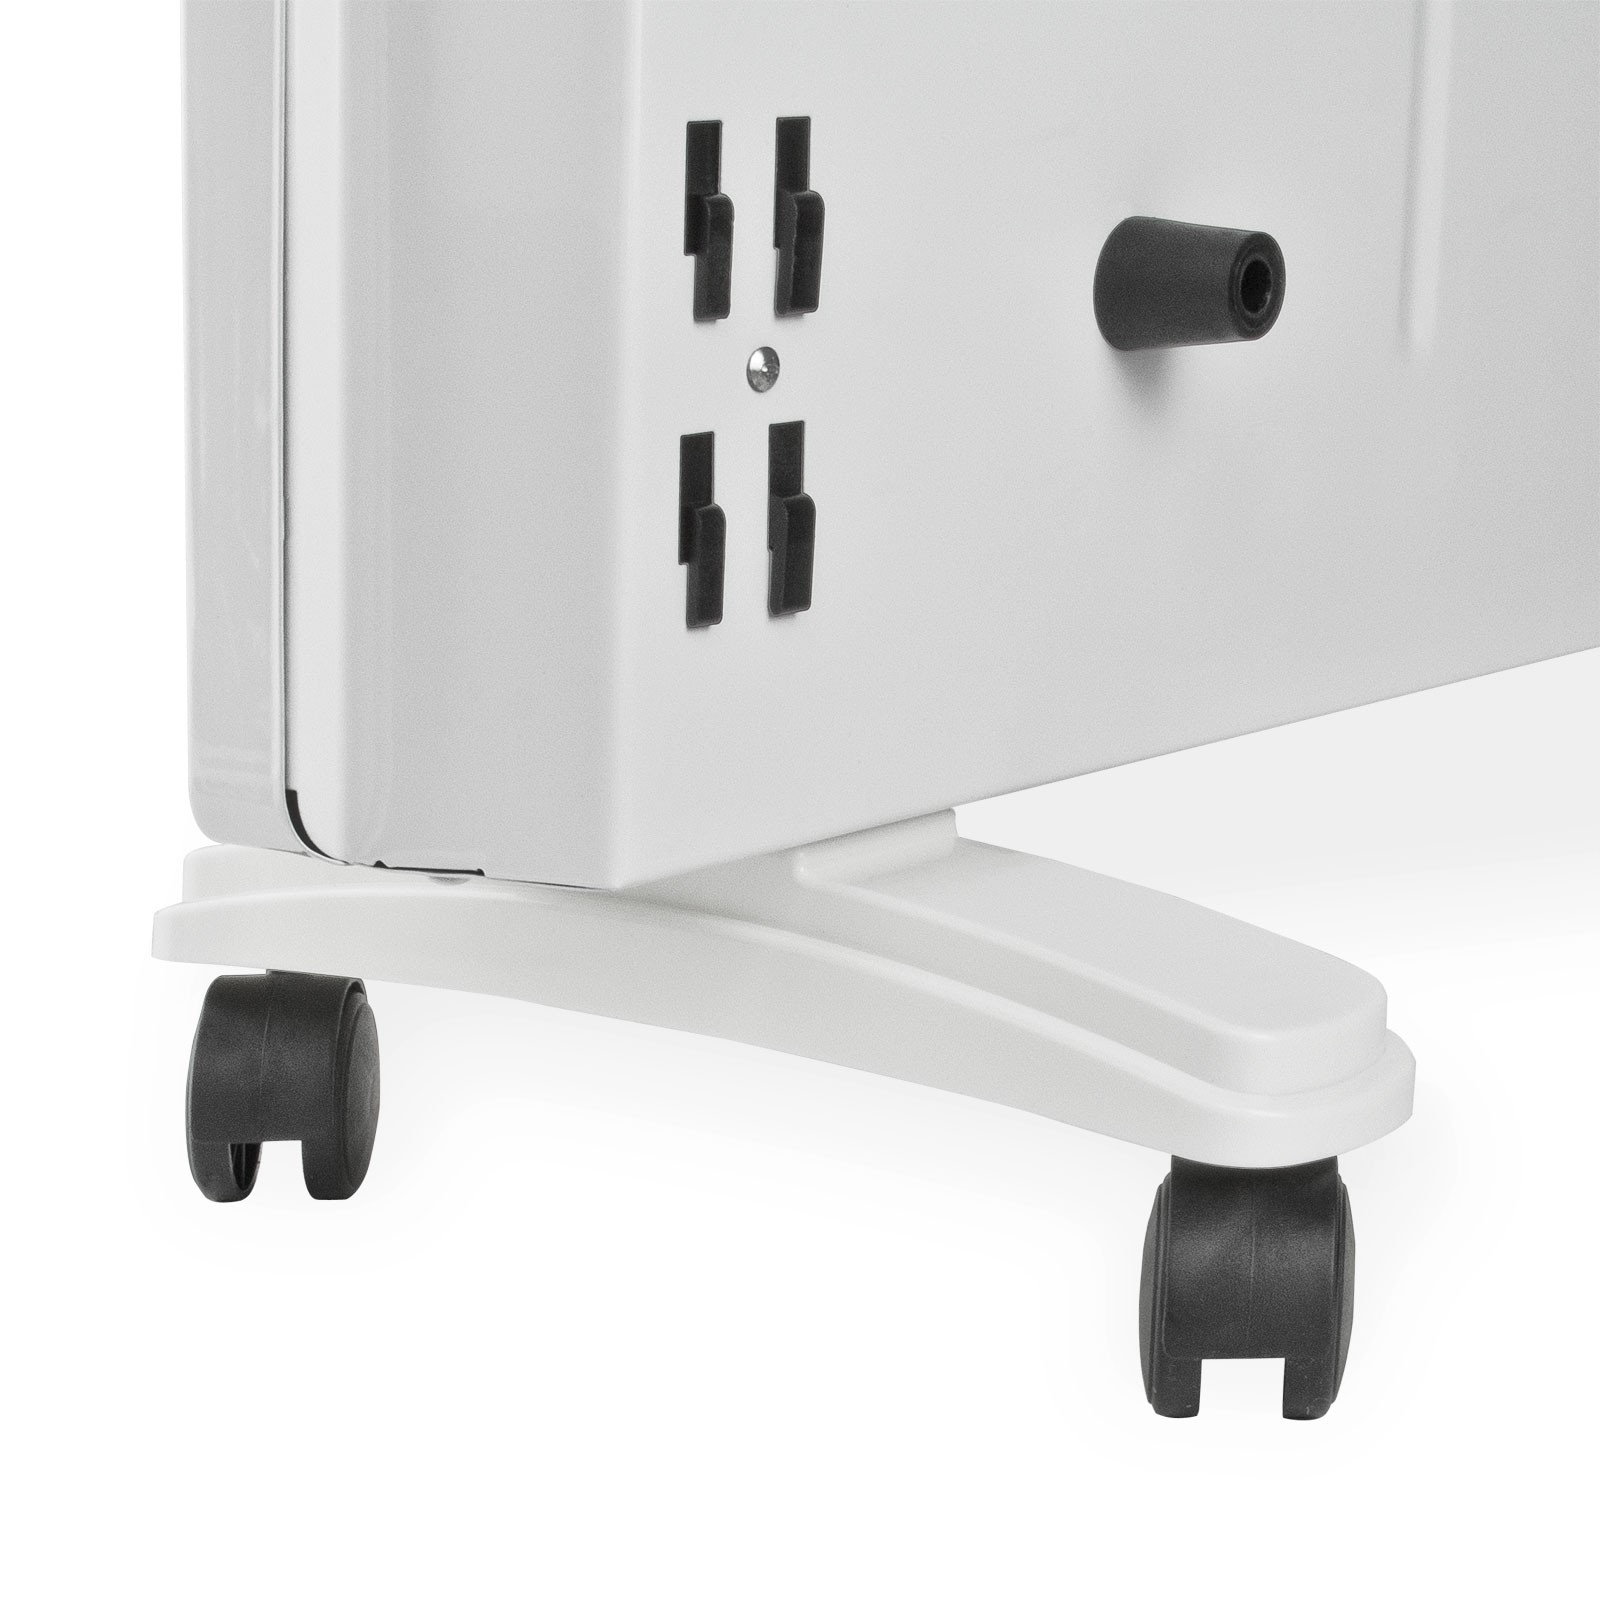 konvektor heizk rper elektroheizung raumheizer elektroheizk rper heizer rh 2000w ebay. Black Bedroom Furniture Sets. Home Design Ideas